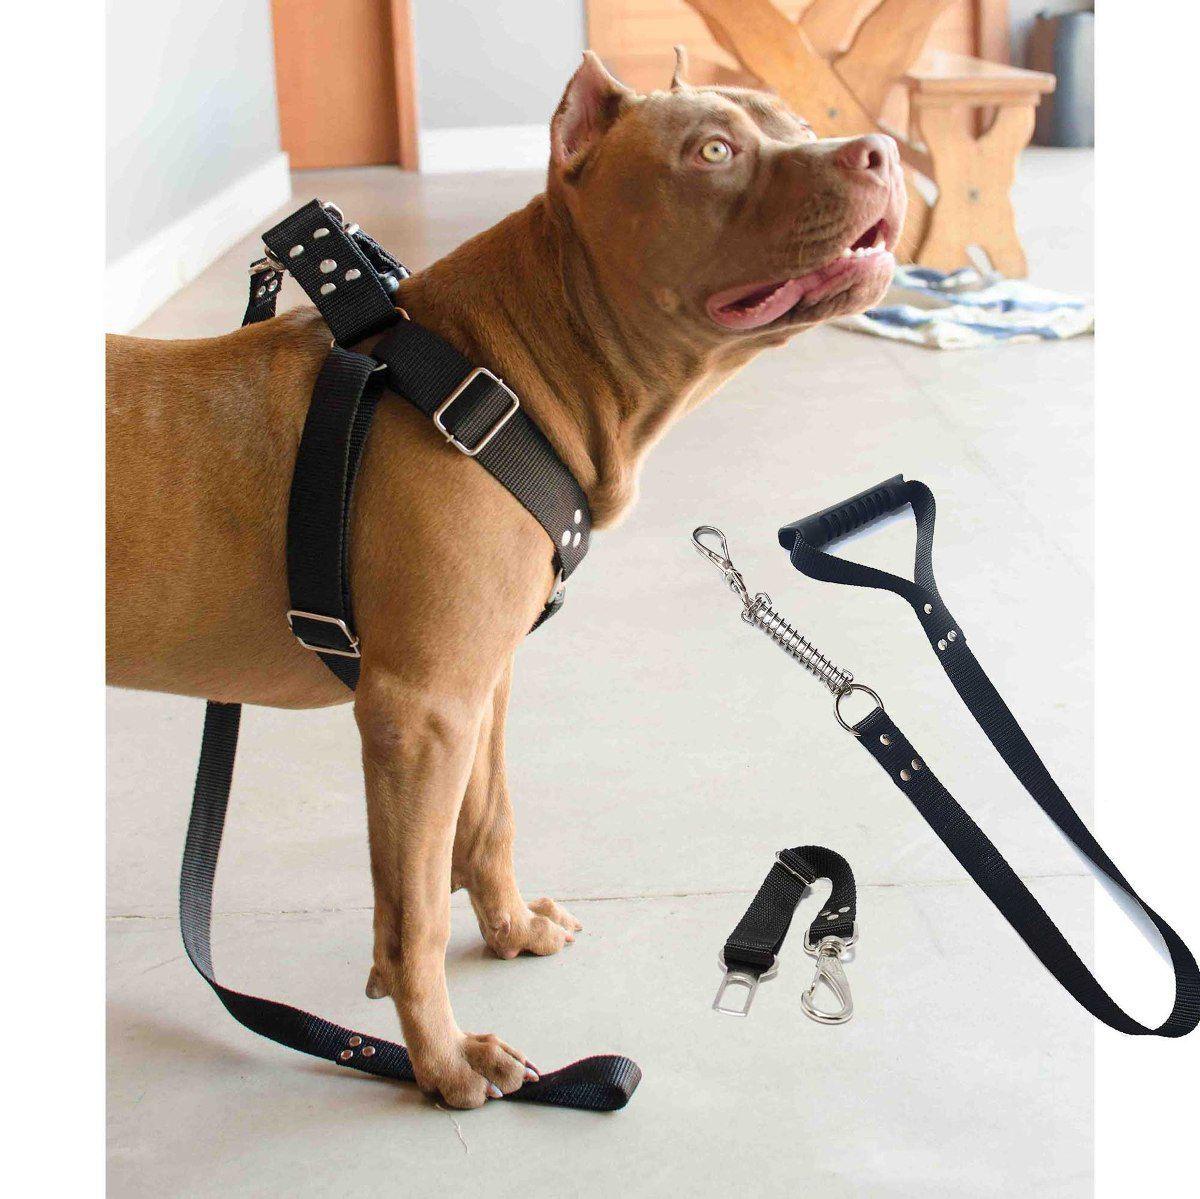 Kit 2x Coleira Peitoral Guia Cinto Segurança Cachorro Doberman Pitbull Anti Puxao - M Preto + Rosa